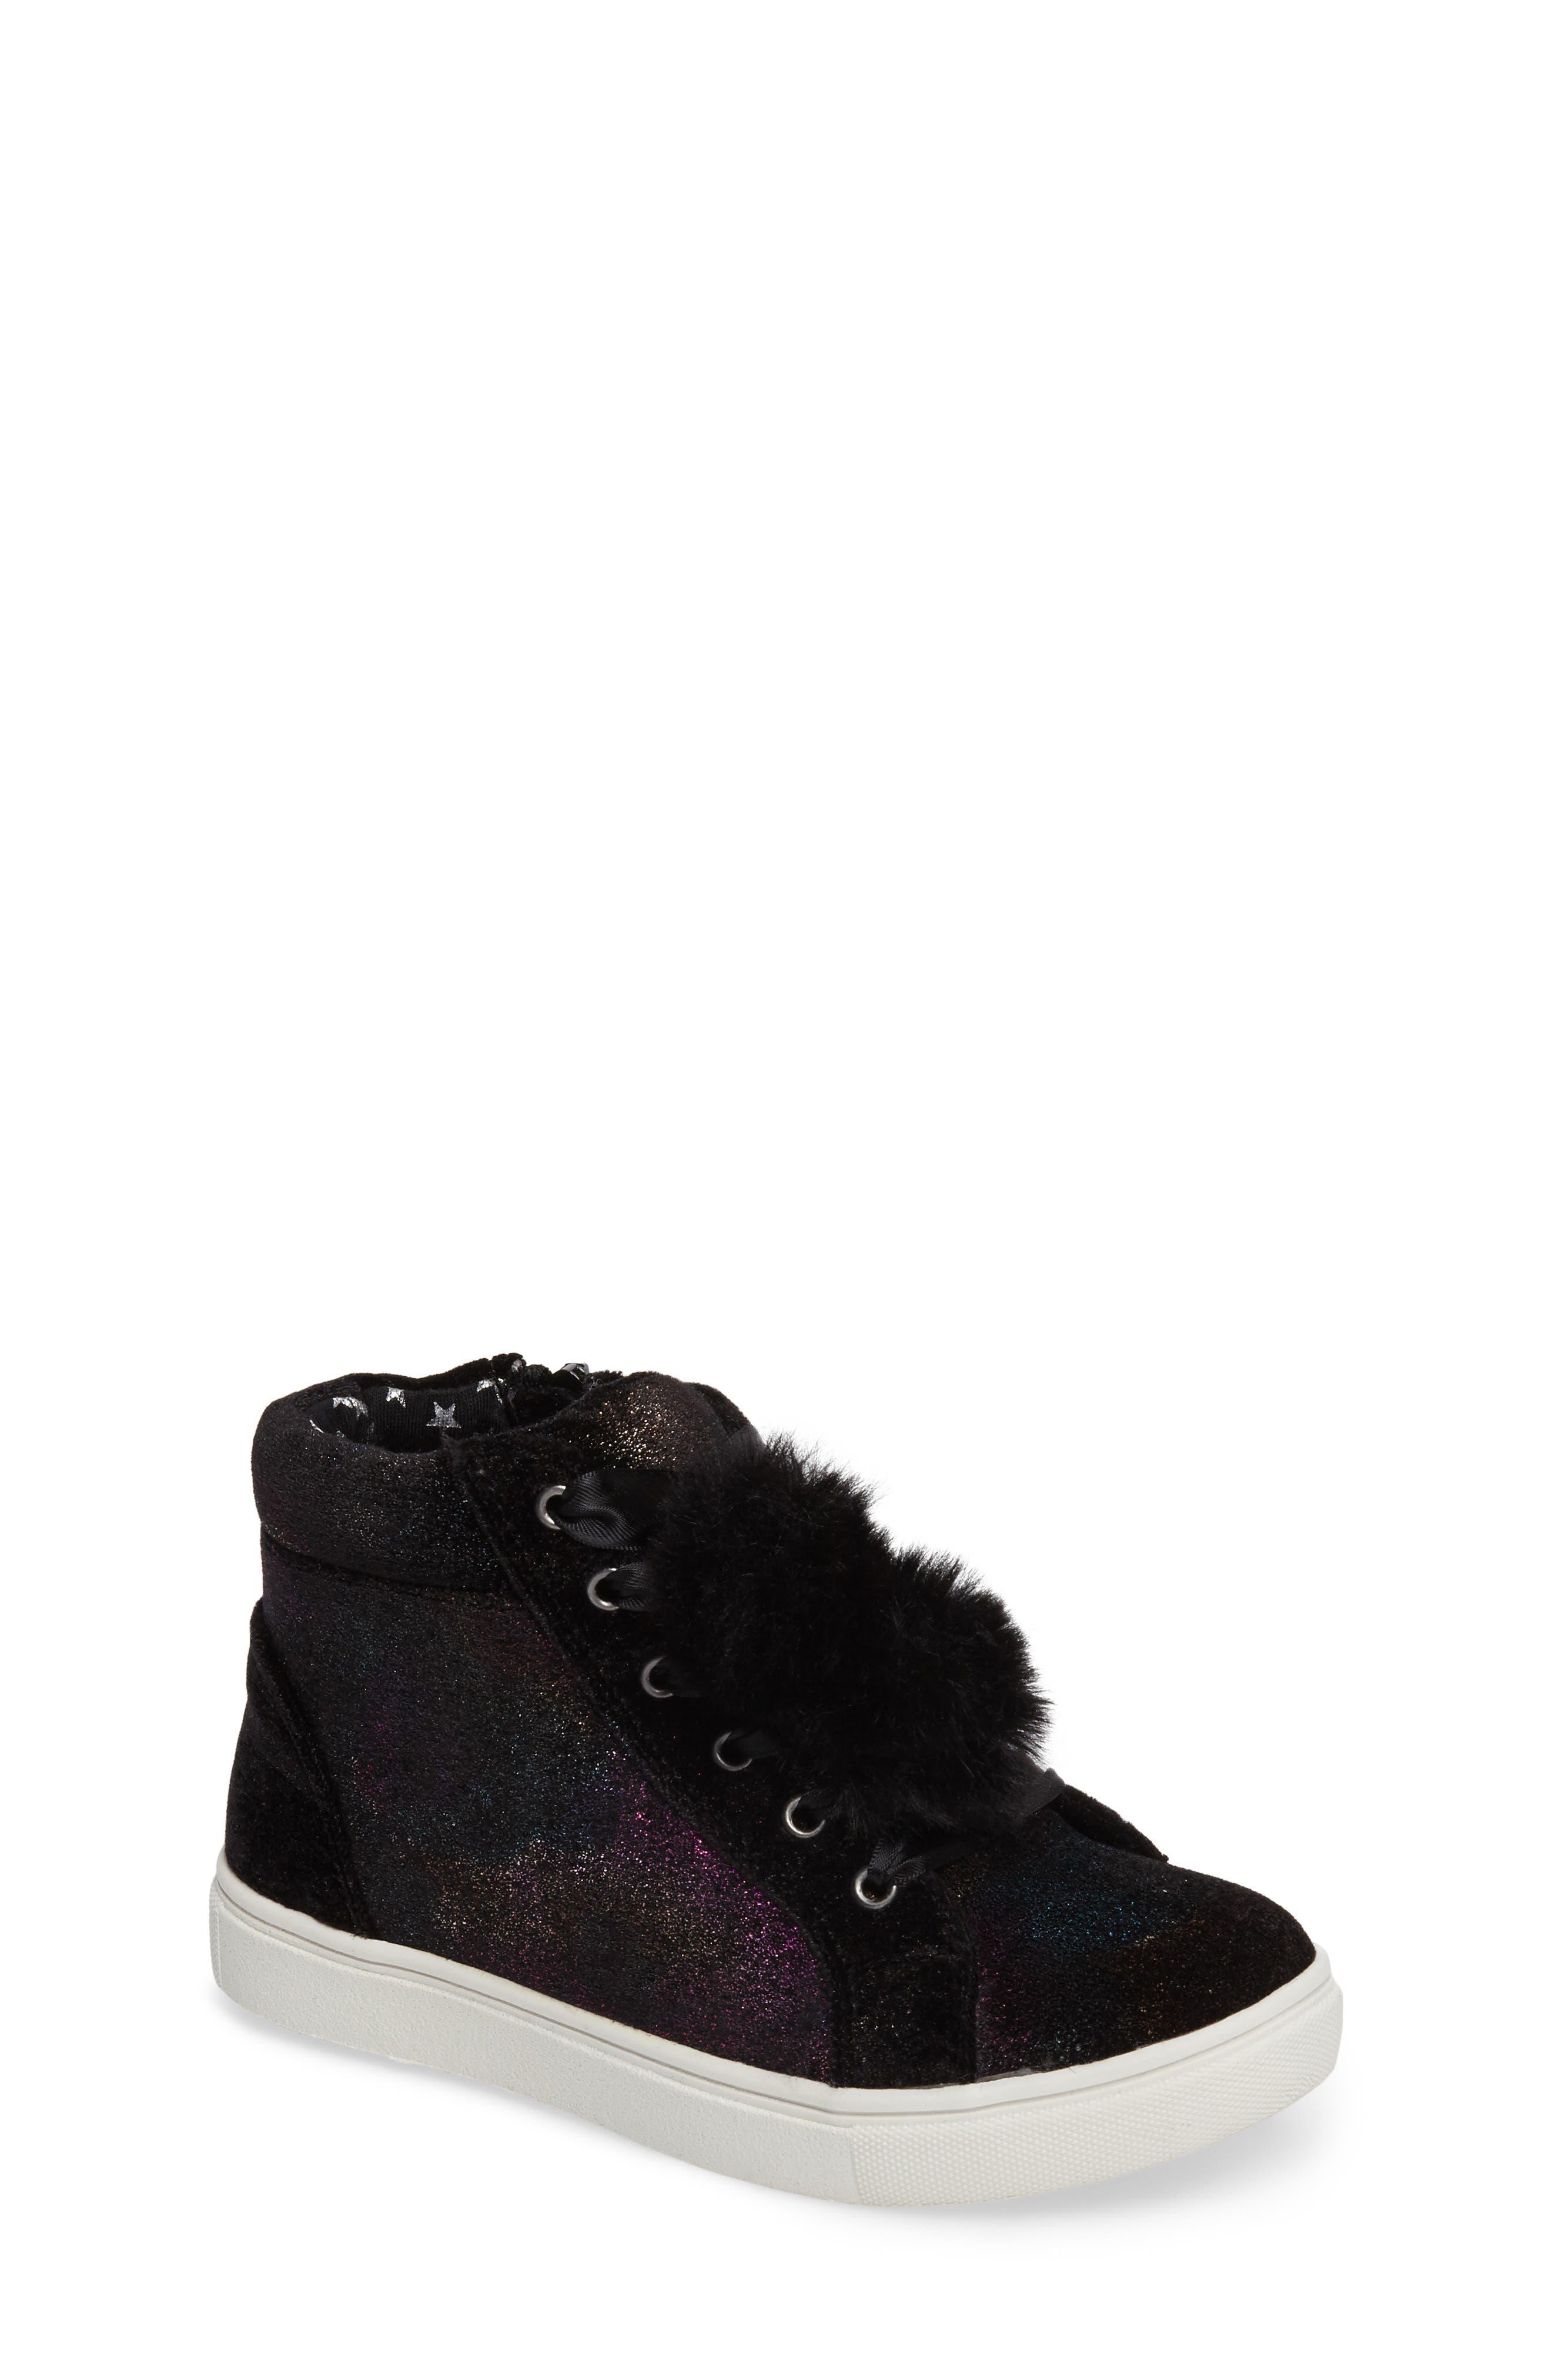 JBrielle High Top Sneaker,                         Main,                         color, 015